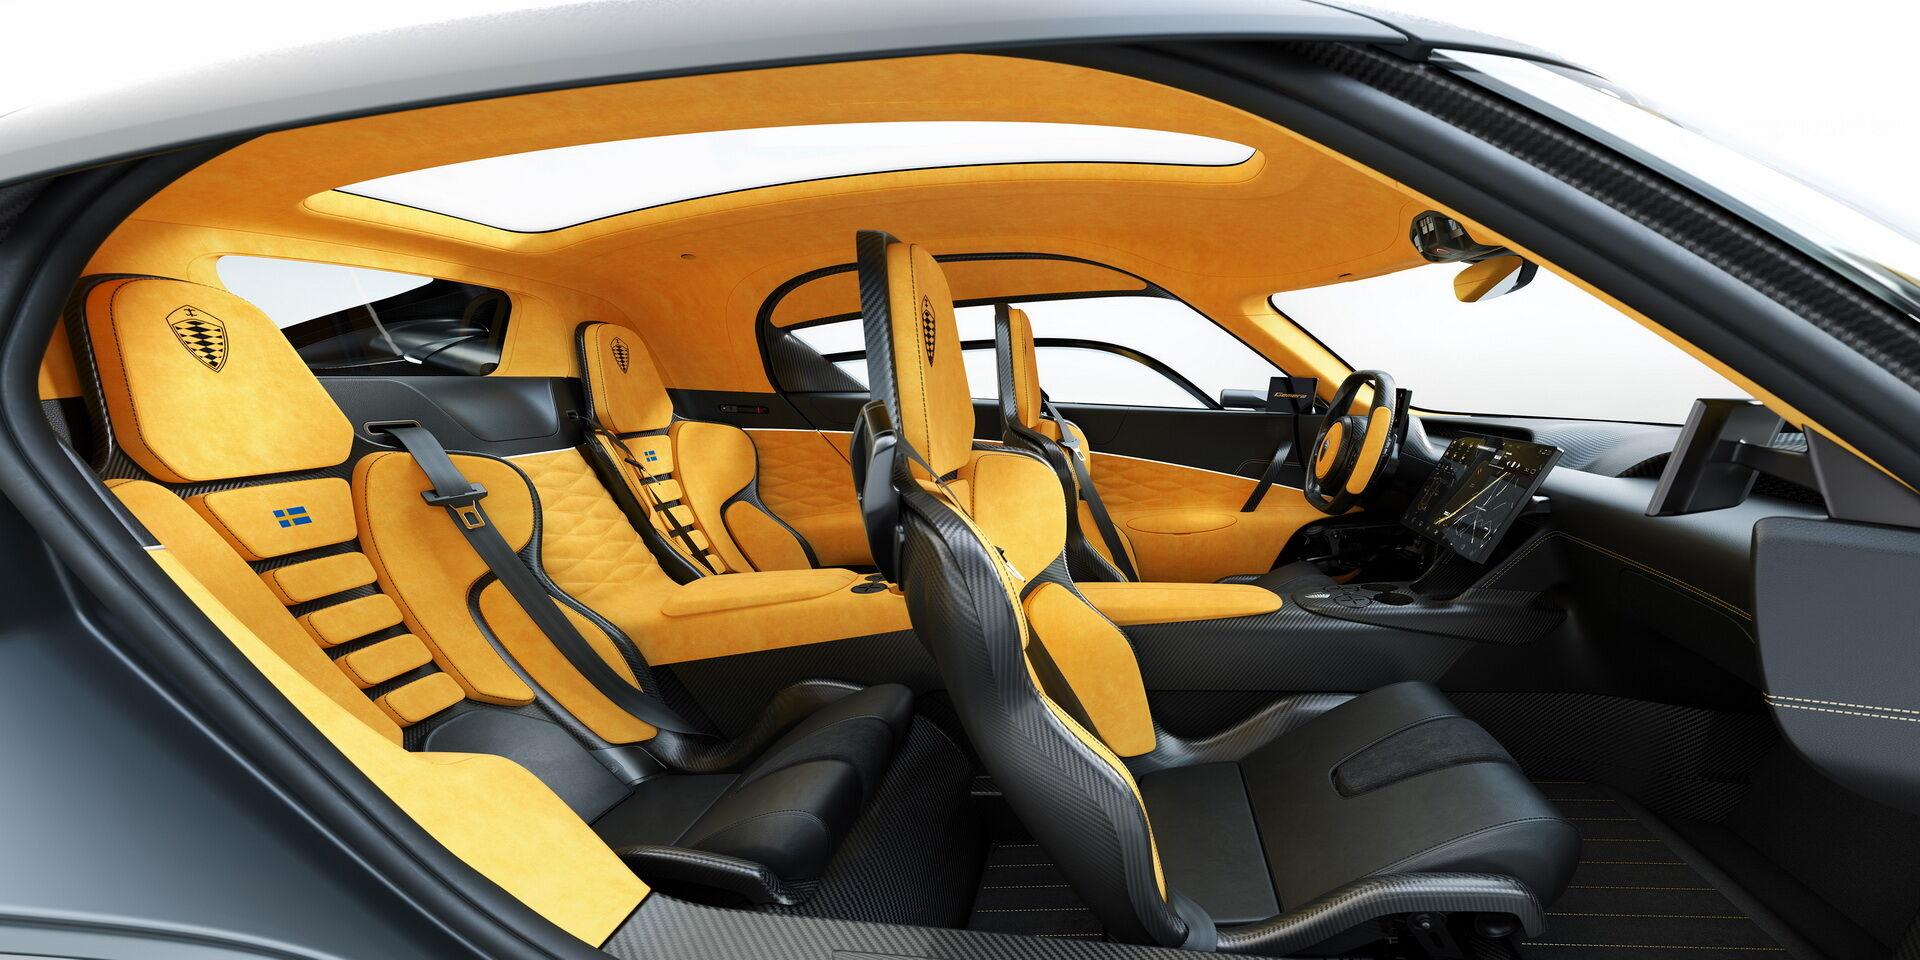 Салон Koenigsegg Gemera способен разметить четырех человек